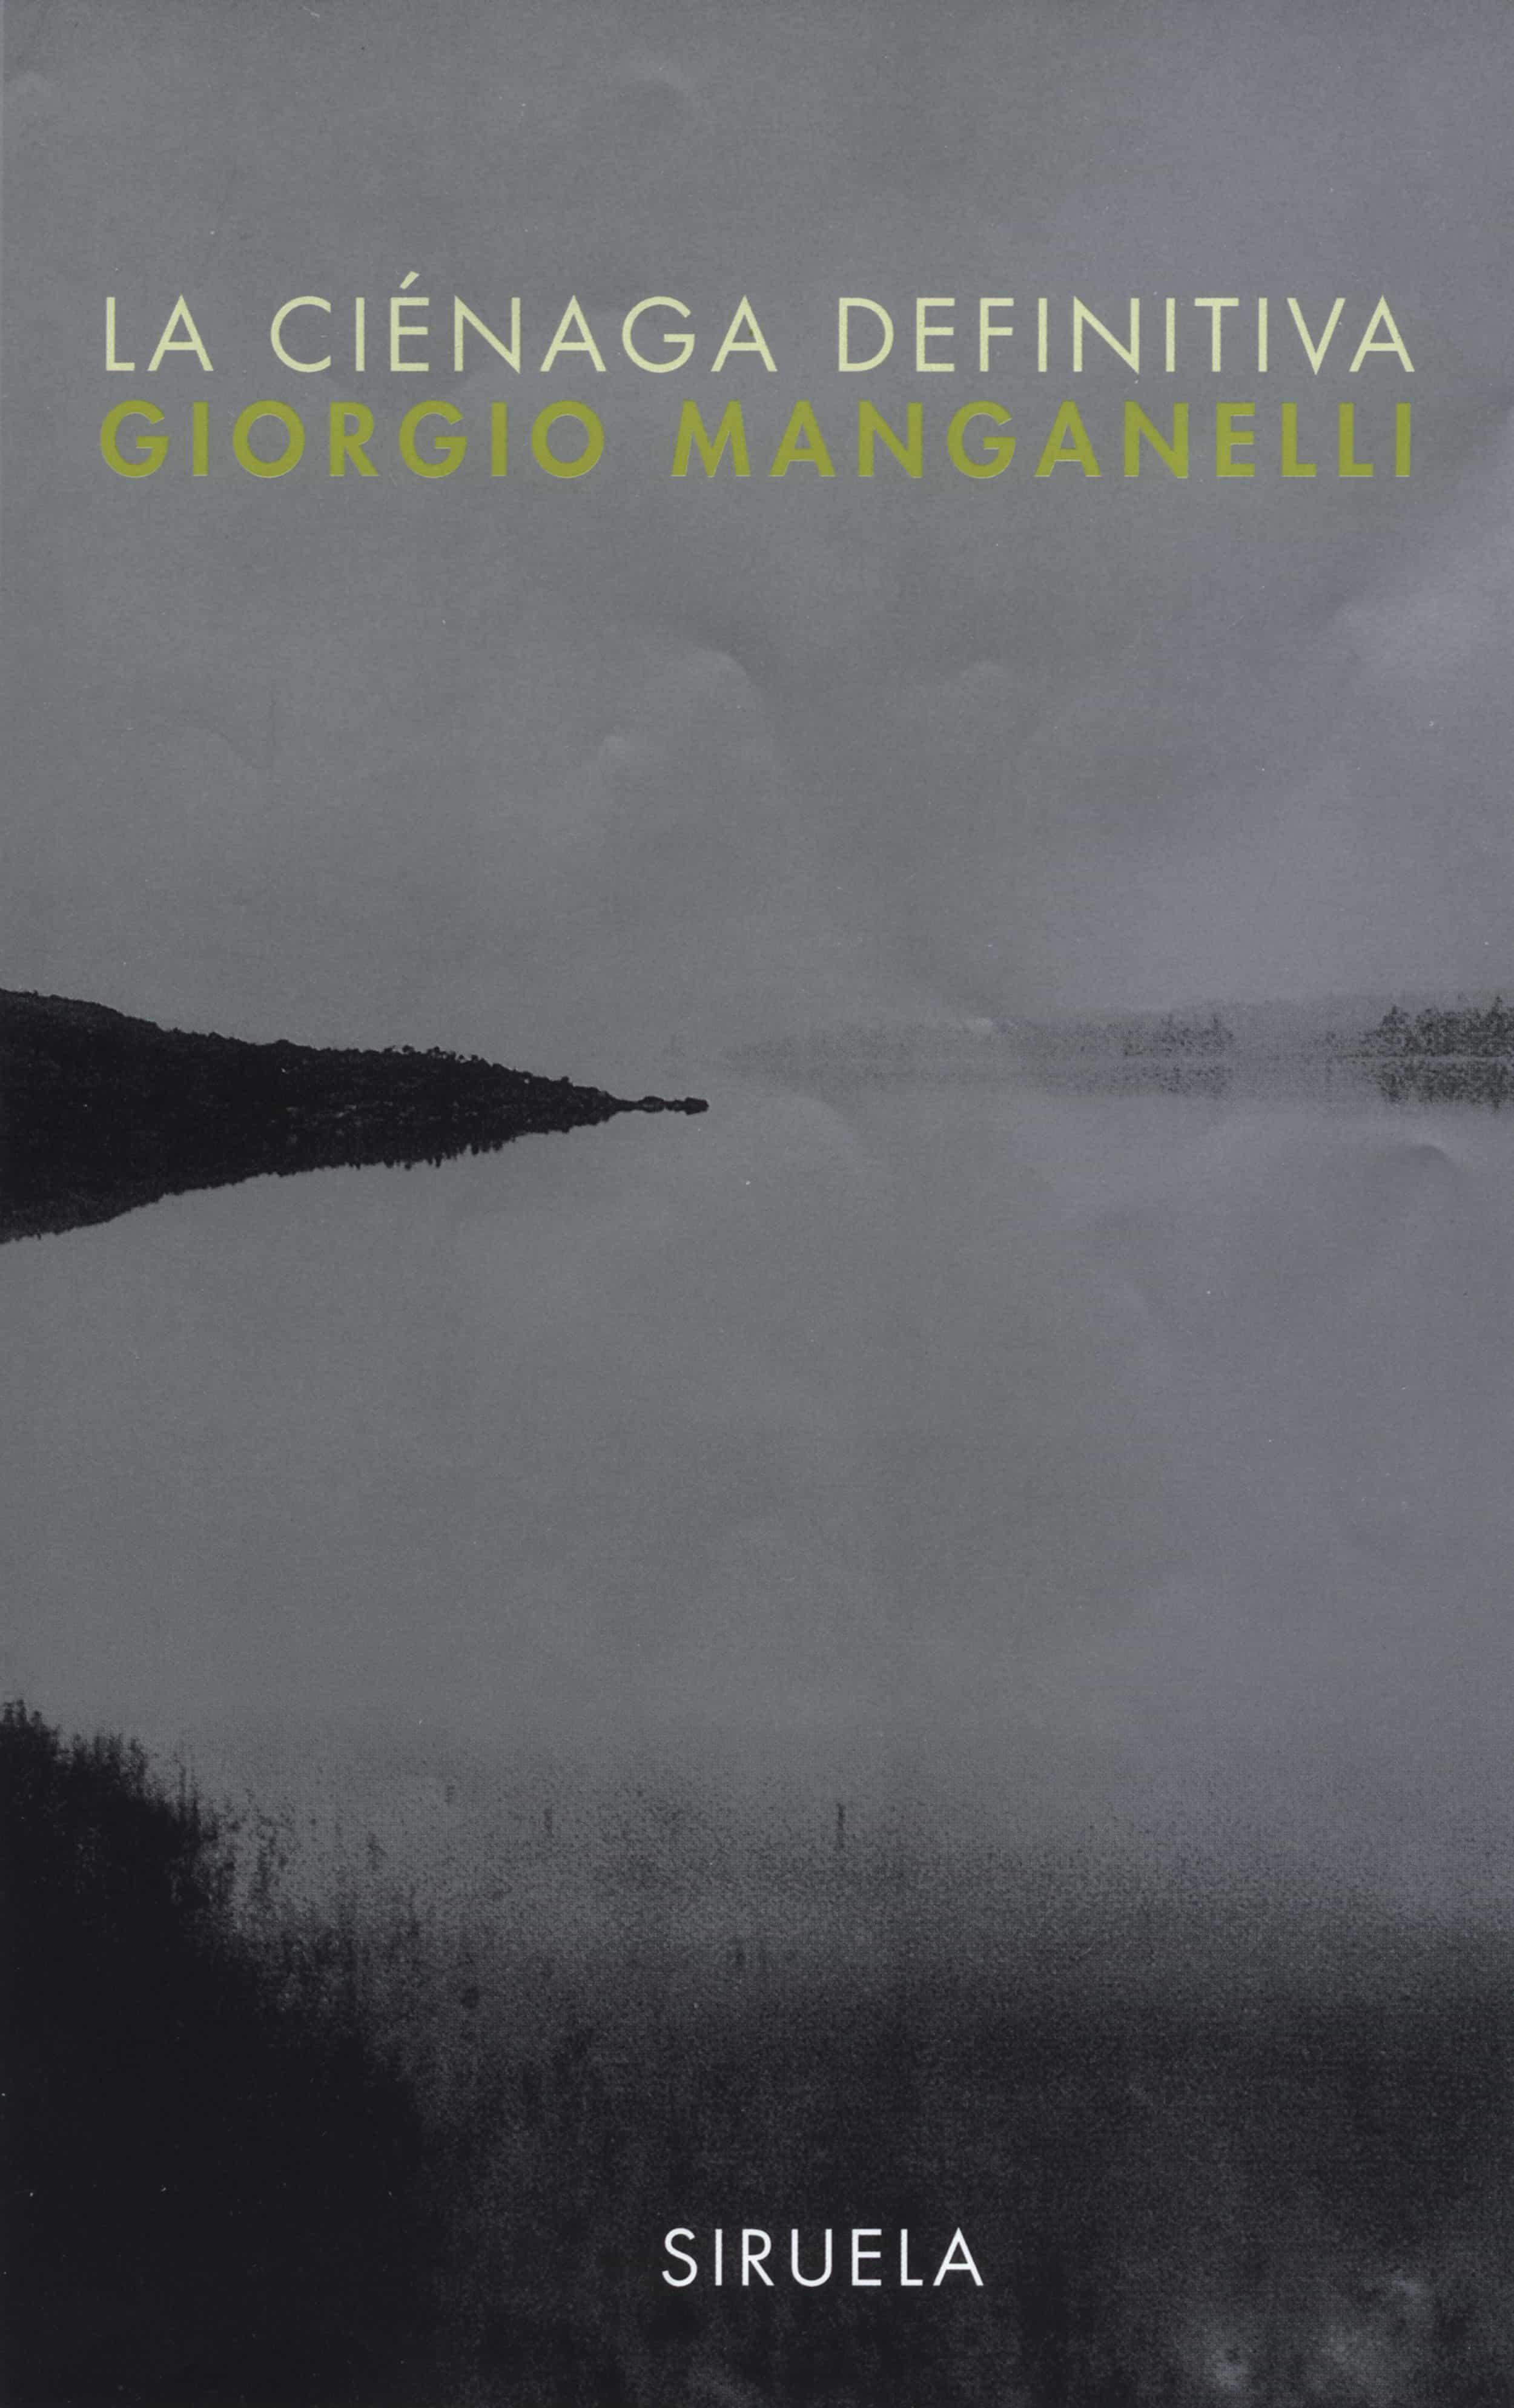 la cienaga definitiva-giorgio manganelli-9788478445929